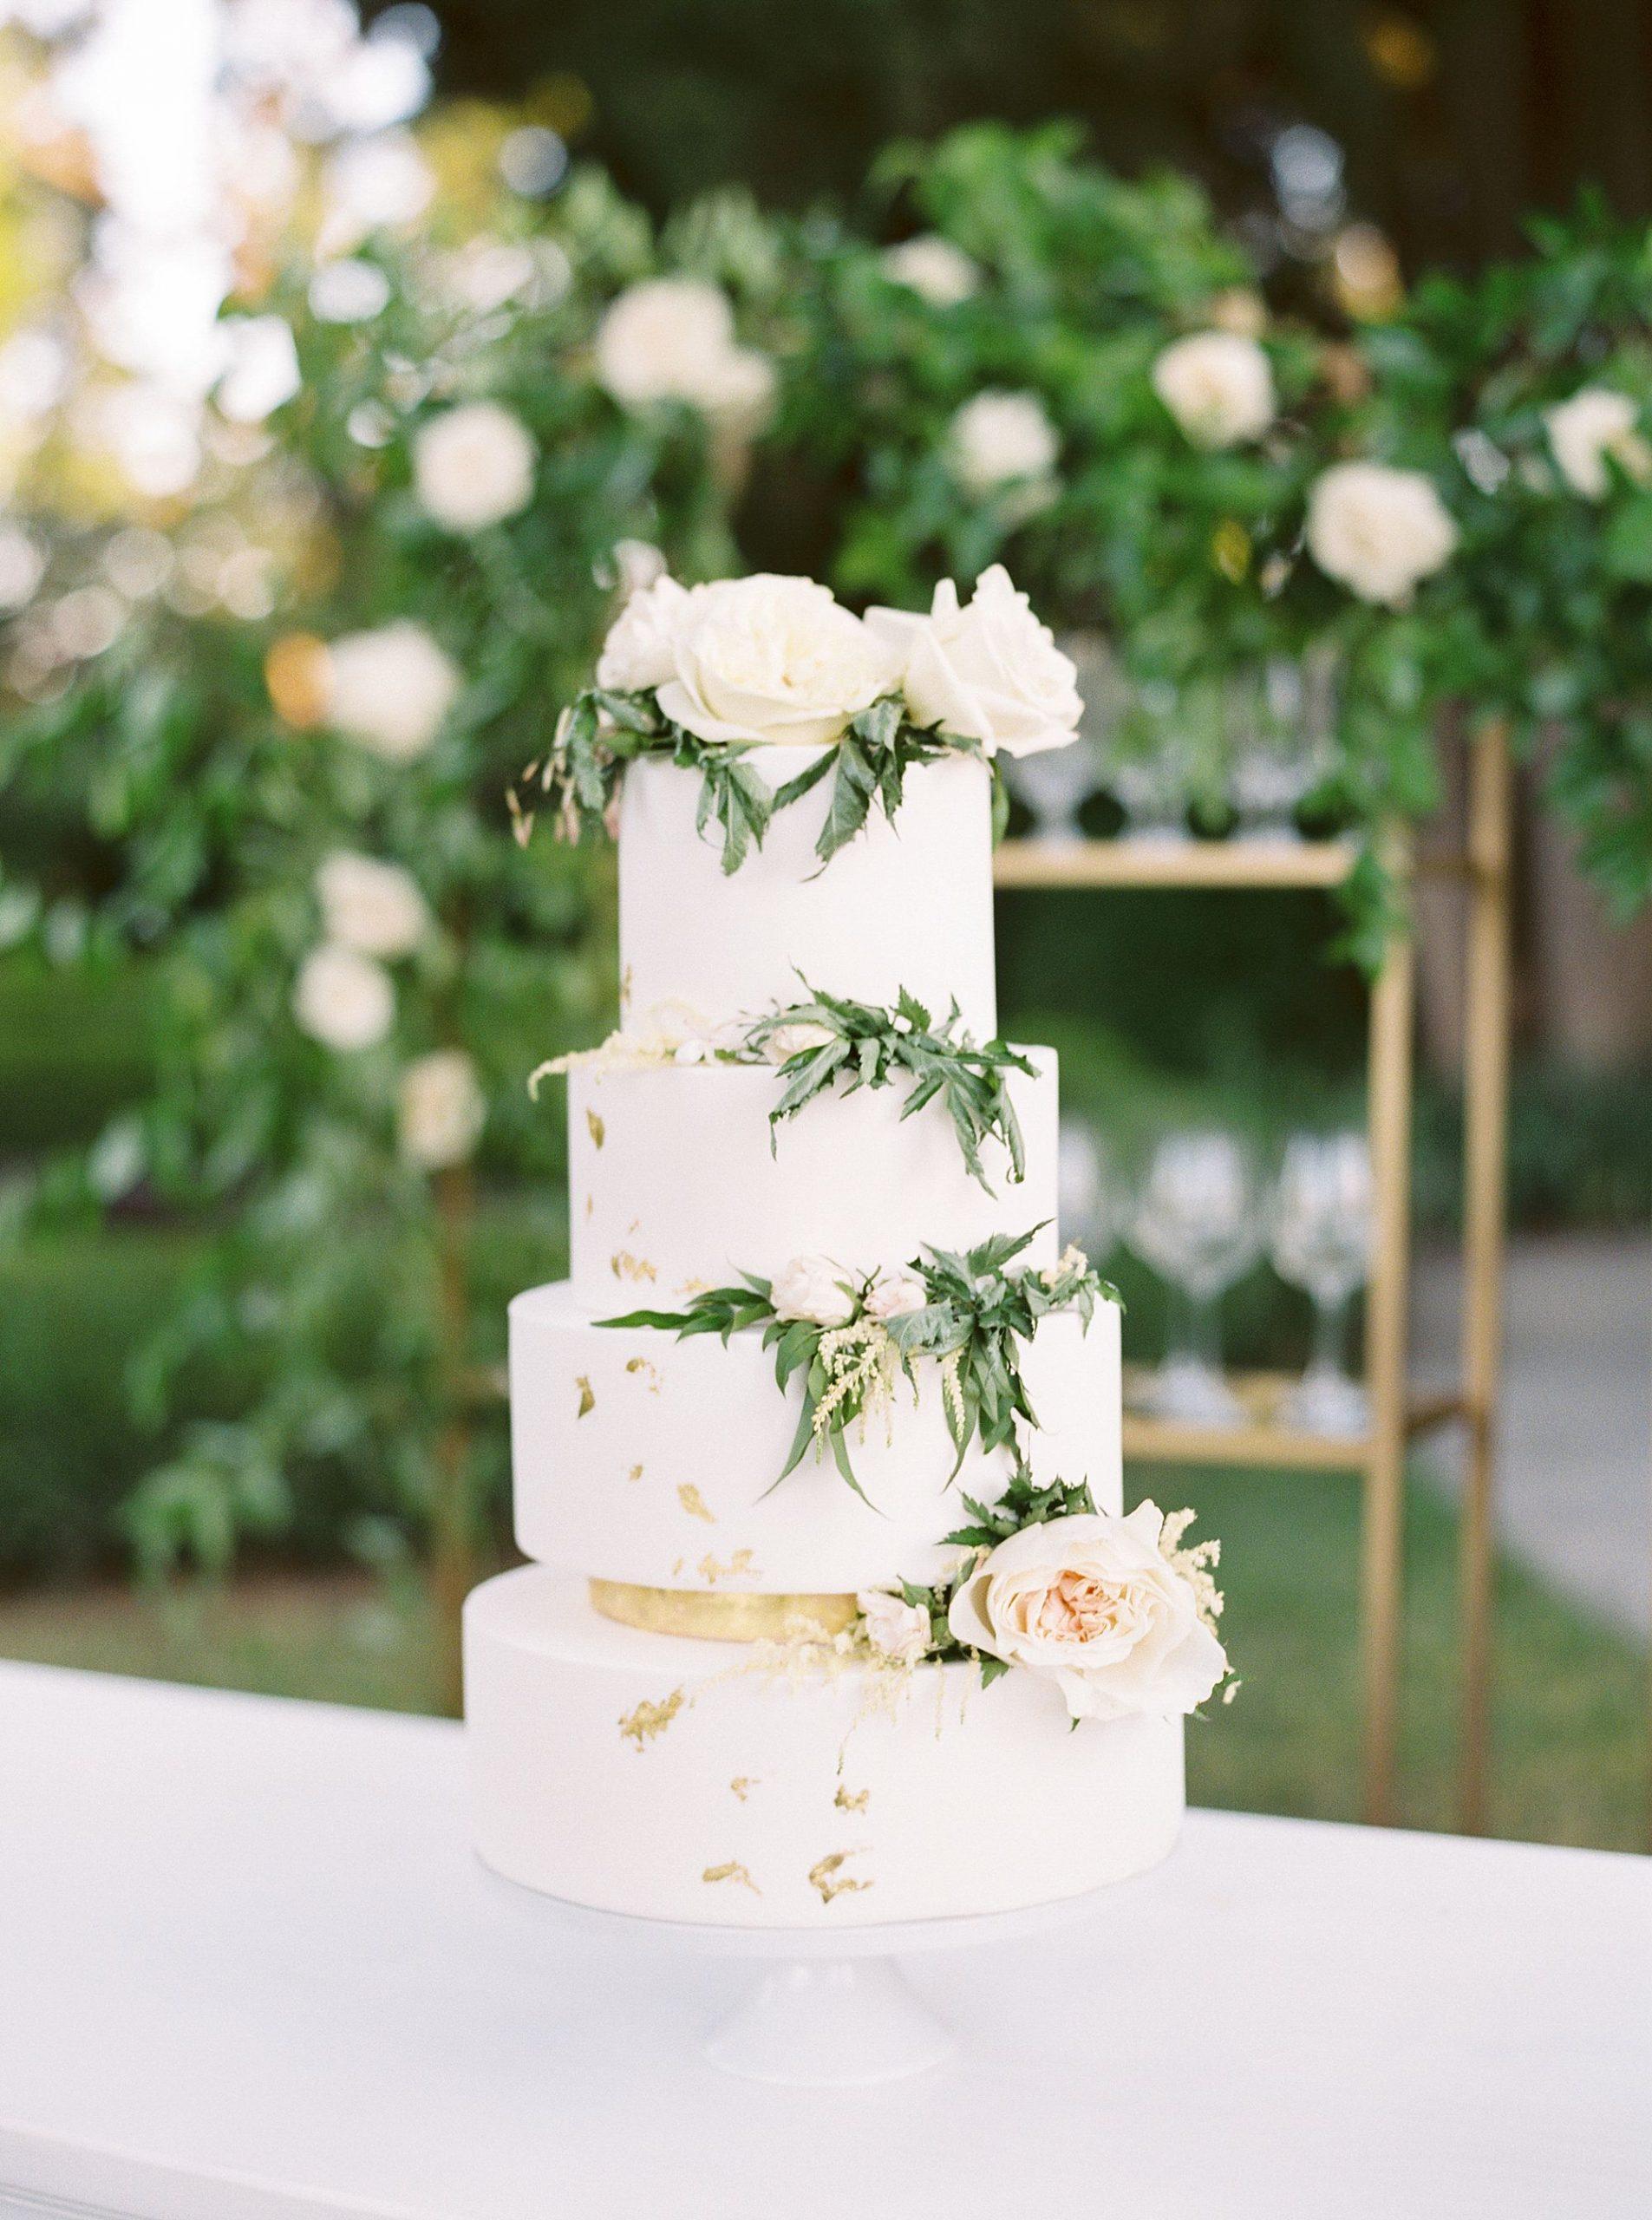 Park Winters Micro-Wedding Inspiration on Style Me Pretty - Stephanie Teague Events - Ashley Baumgartner - Park Winters Wedding - Black Tie Wedding - Micro-Wedding Sacramento Photographer_0040.jpg